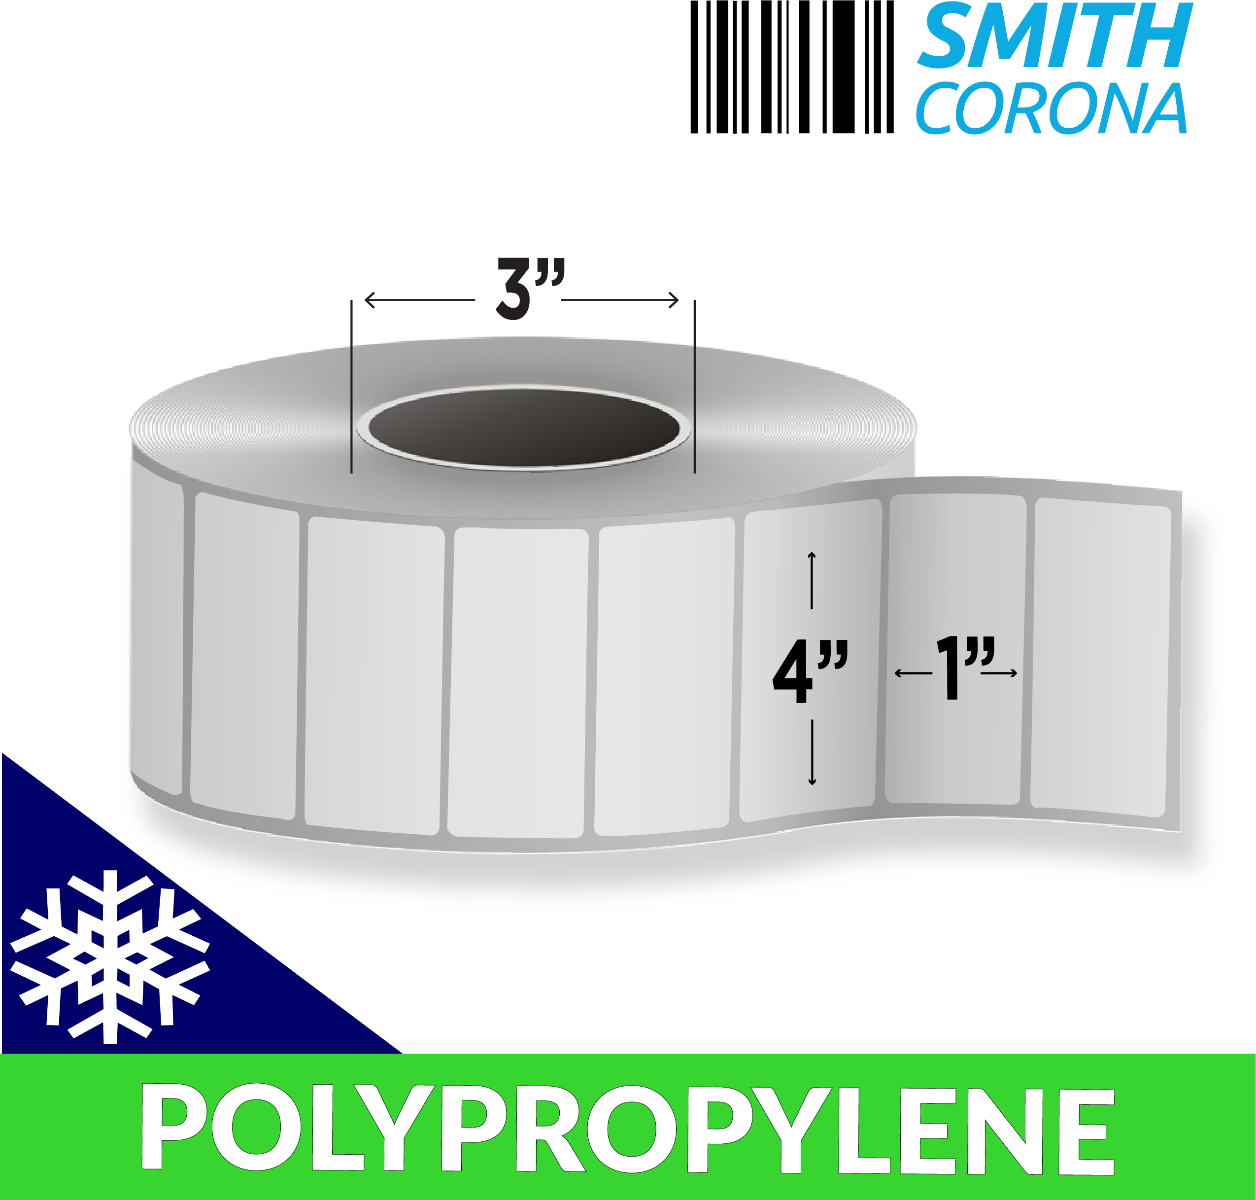 "4"" x 1"" Polypropylene (Freezer Grade) - Direct Thermal Labels - 3"" Core"